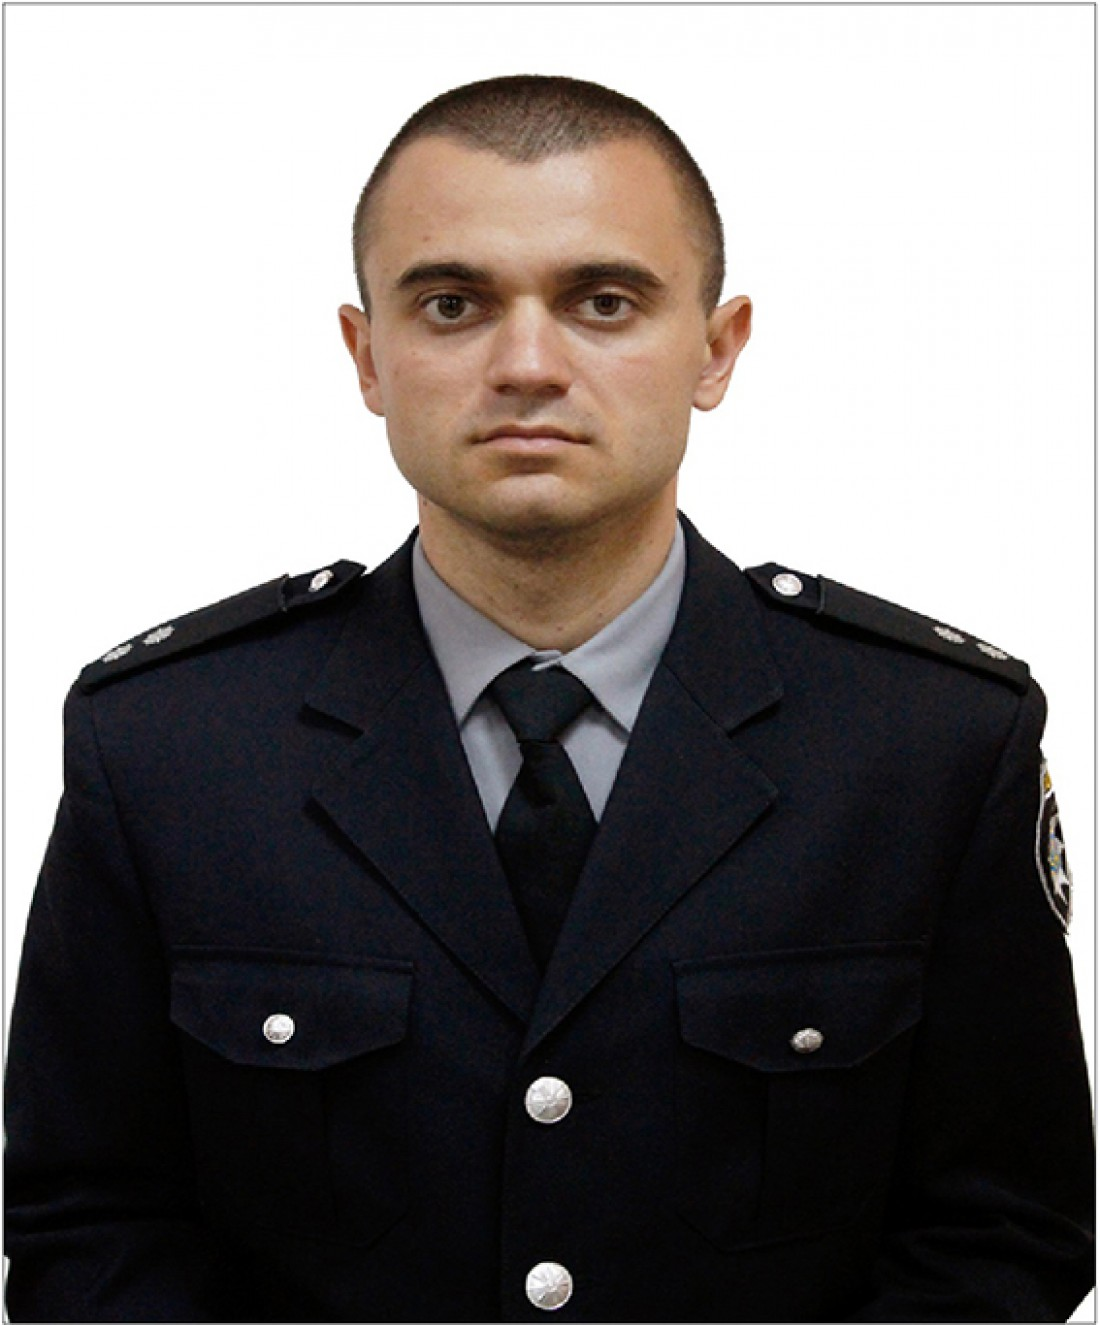 Погибший лейтенант полиции Александр Маница